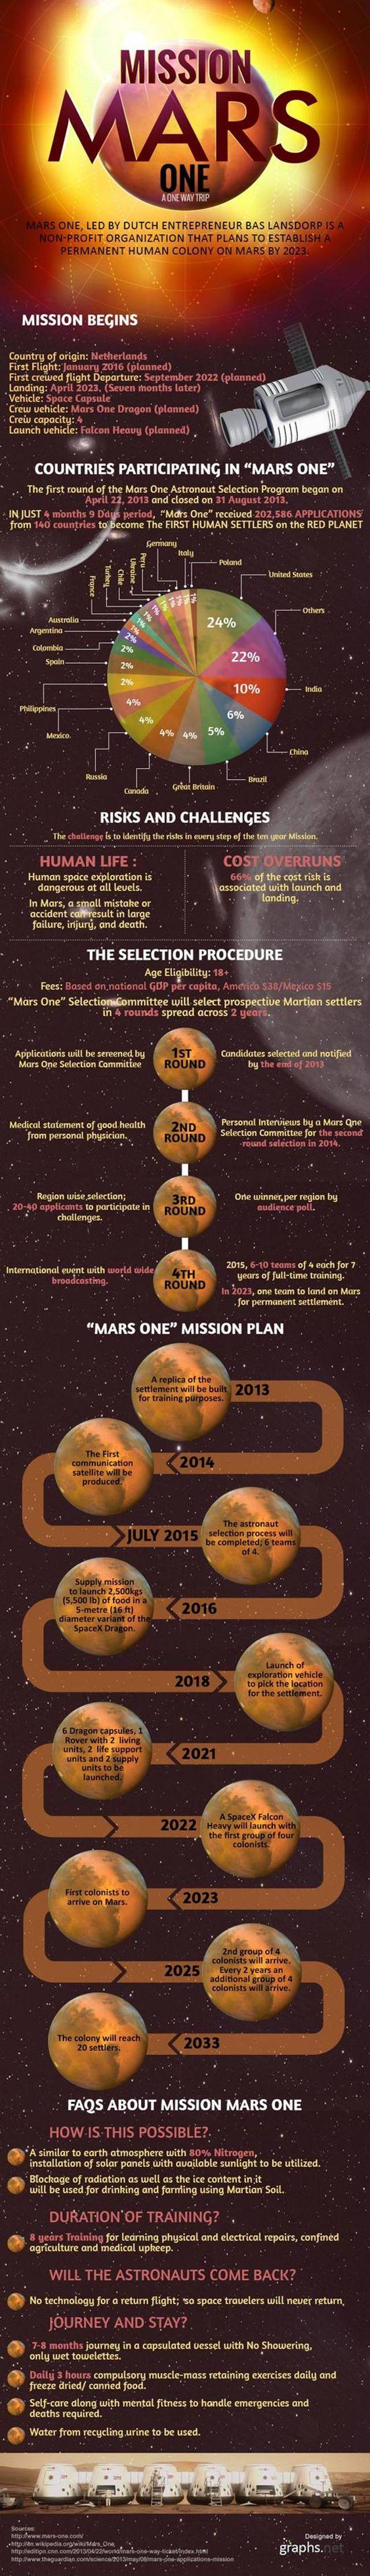 Mars 1 Way Trip Bbbbeaaecbba